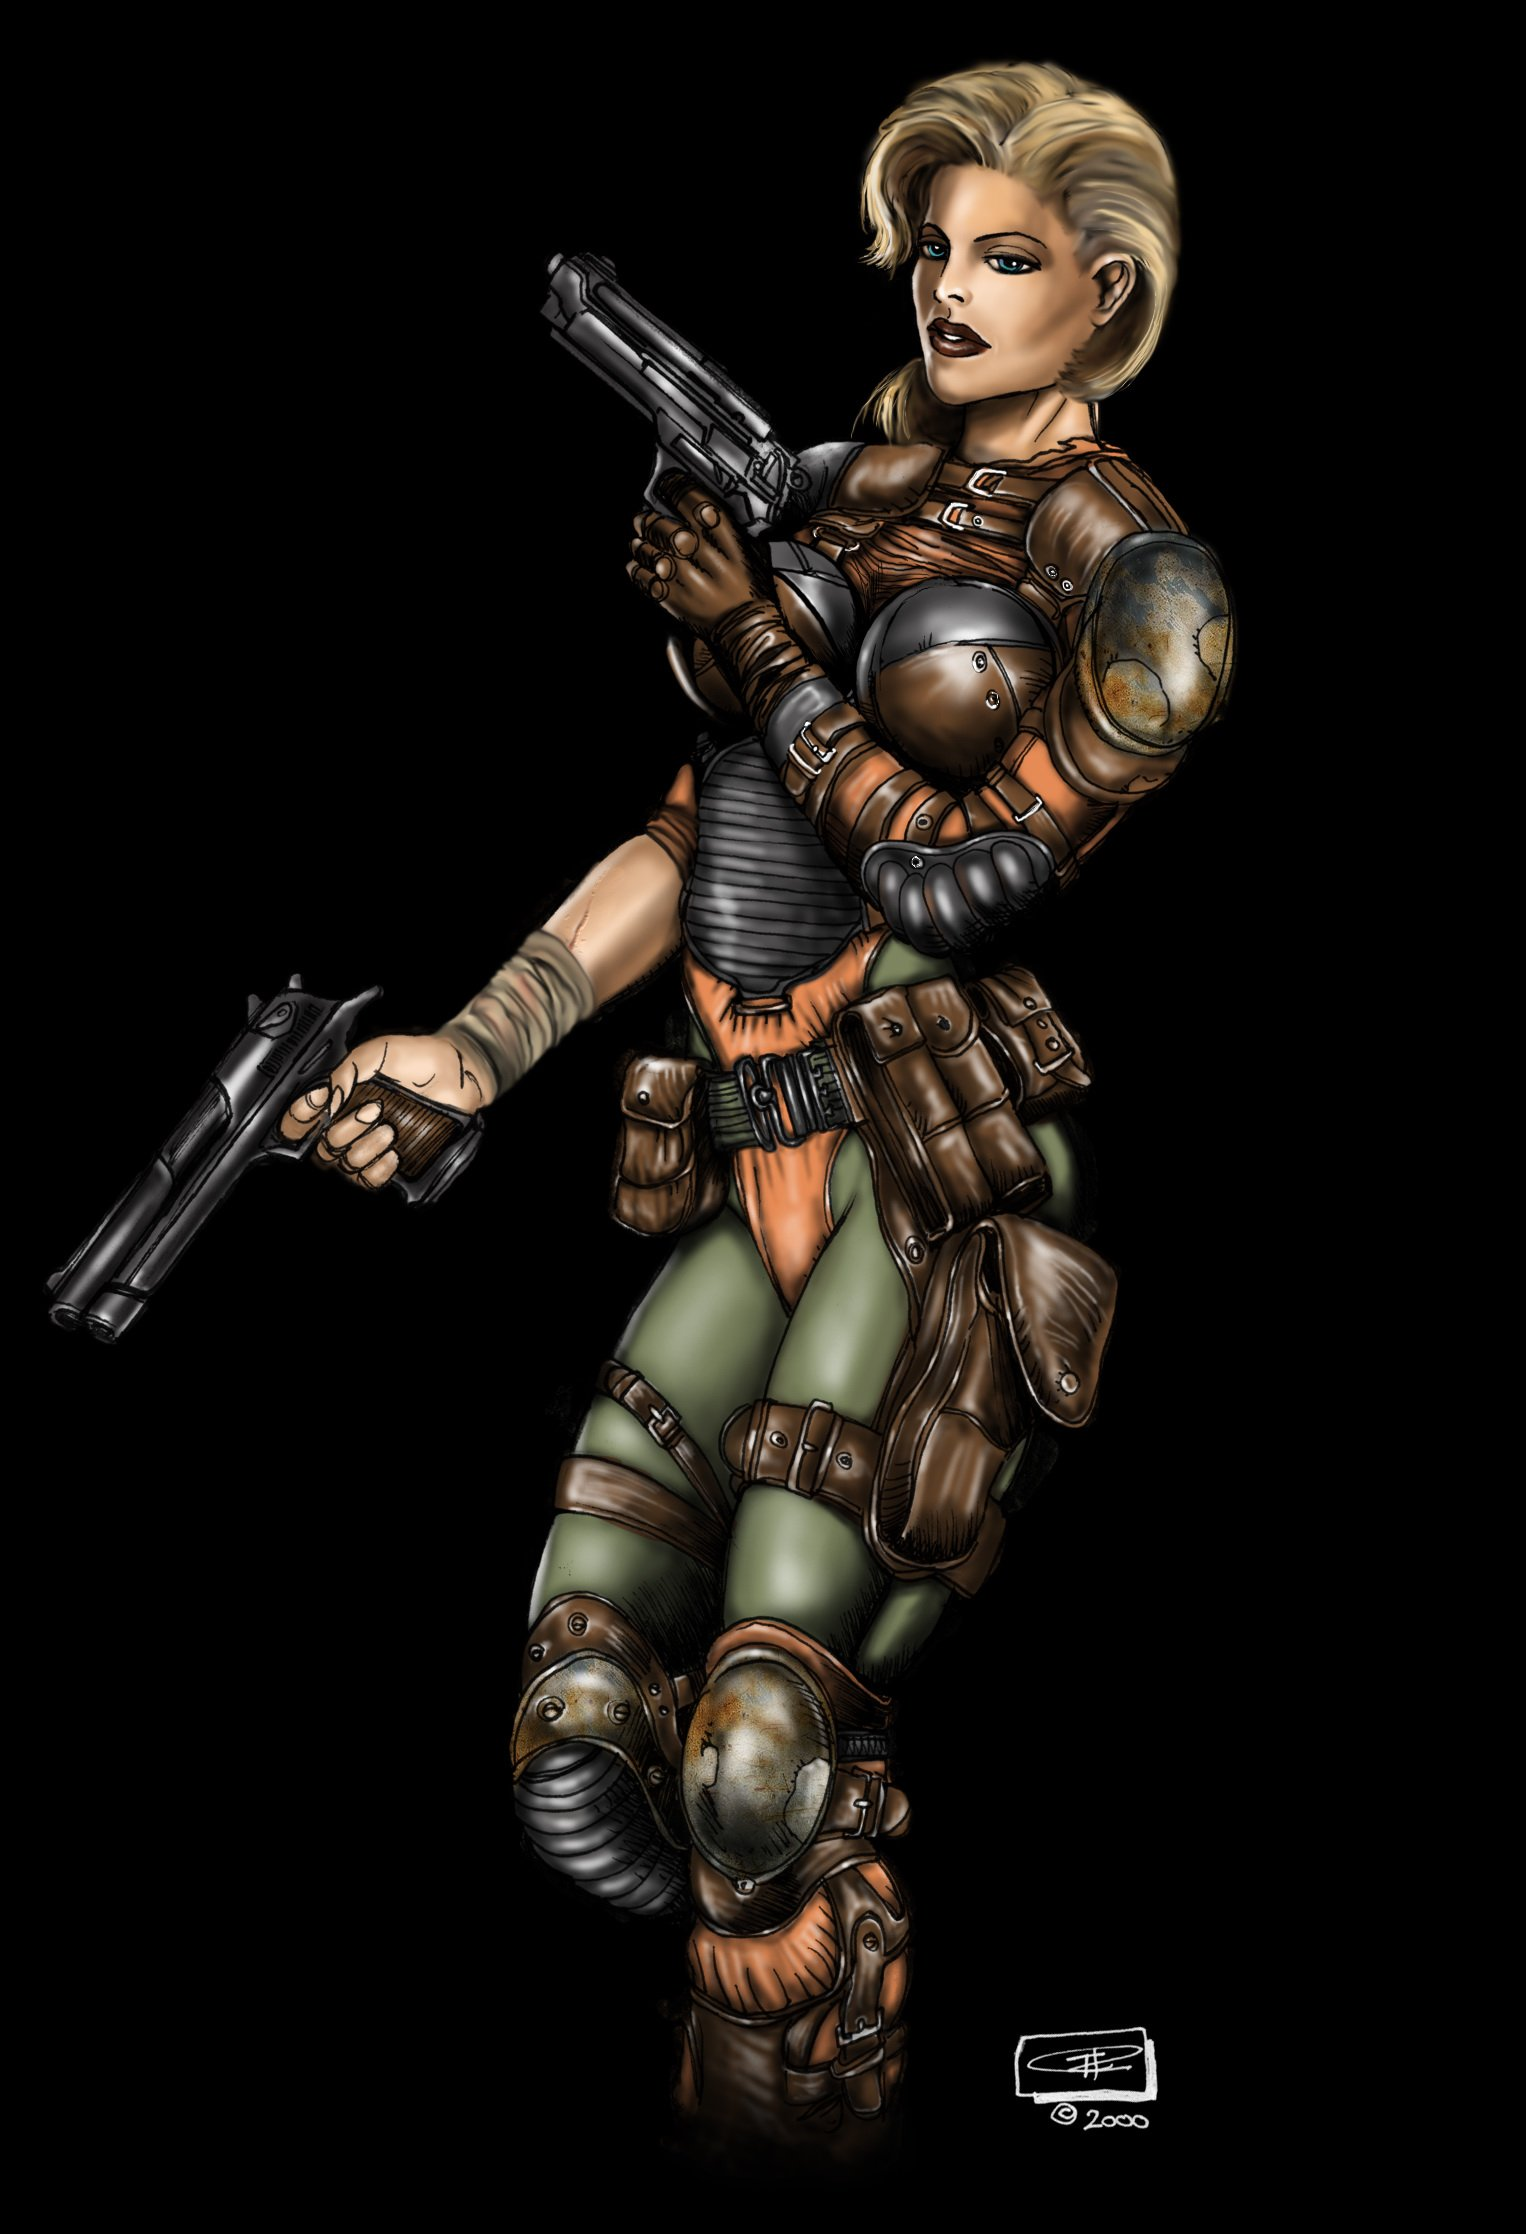 Leather Armor Female